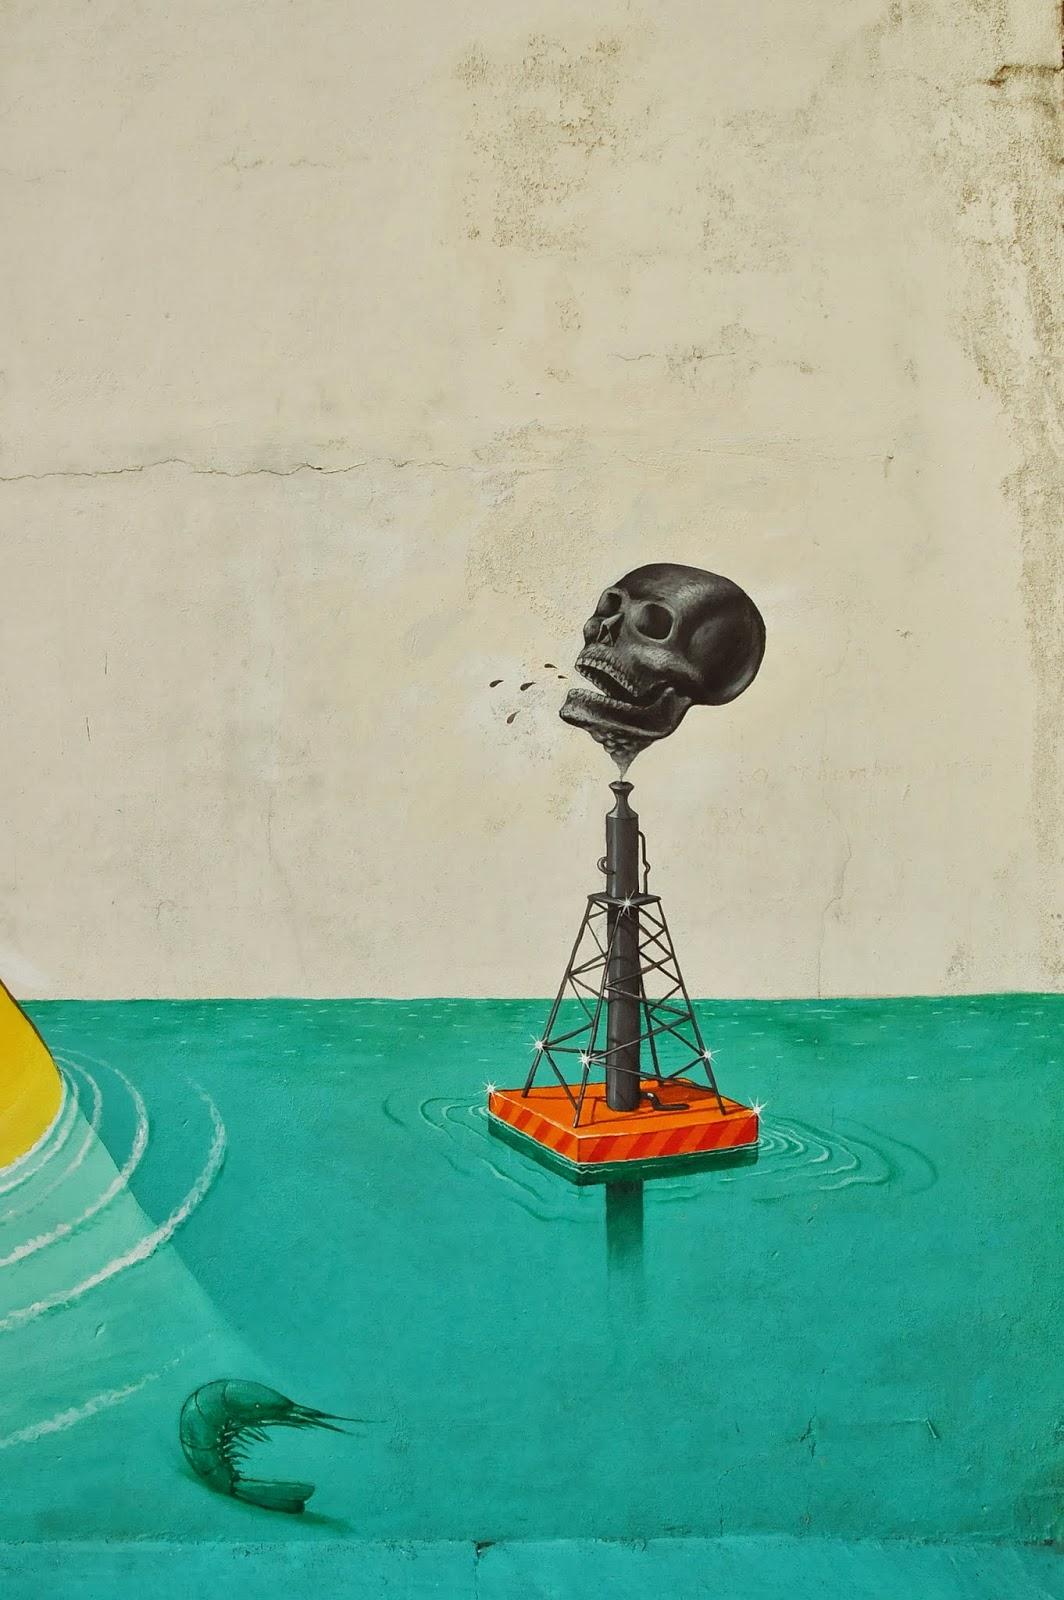 interesni-kazki-new-mural-campeche-mexico-12